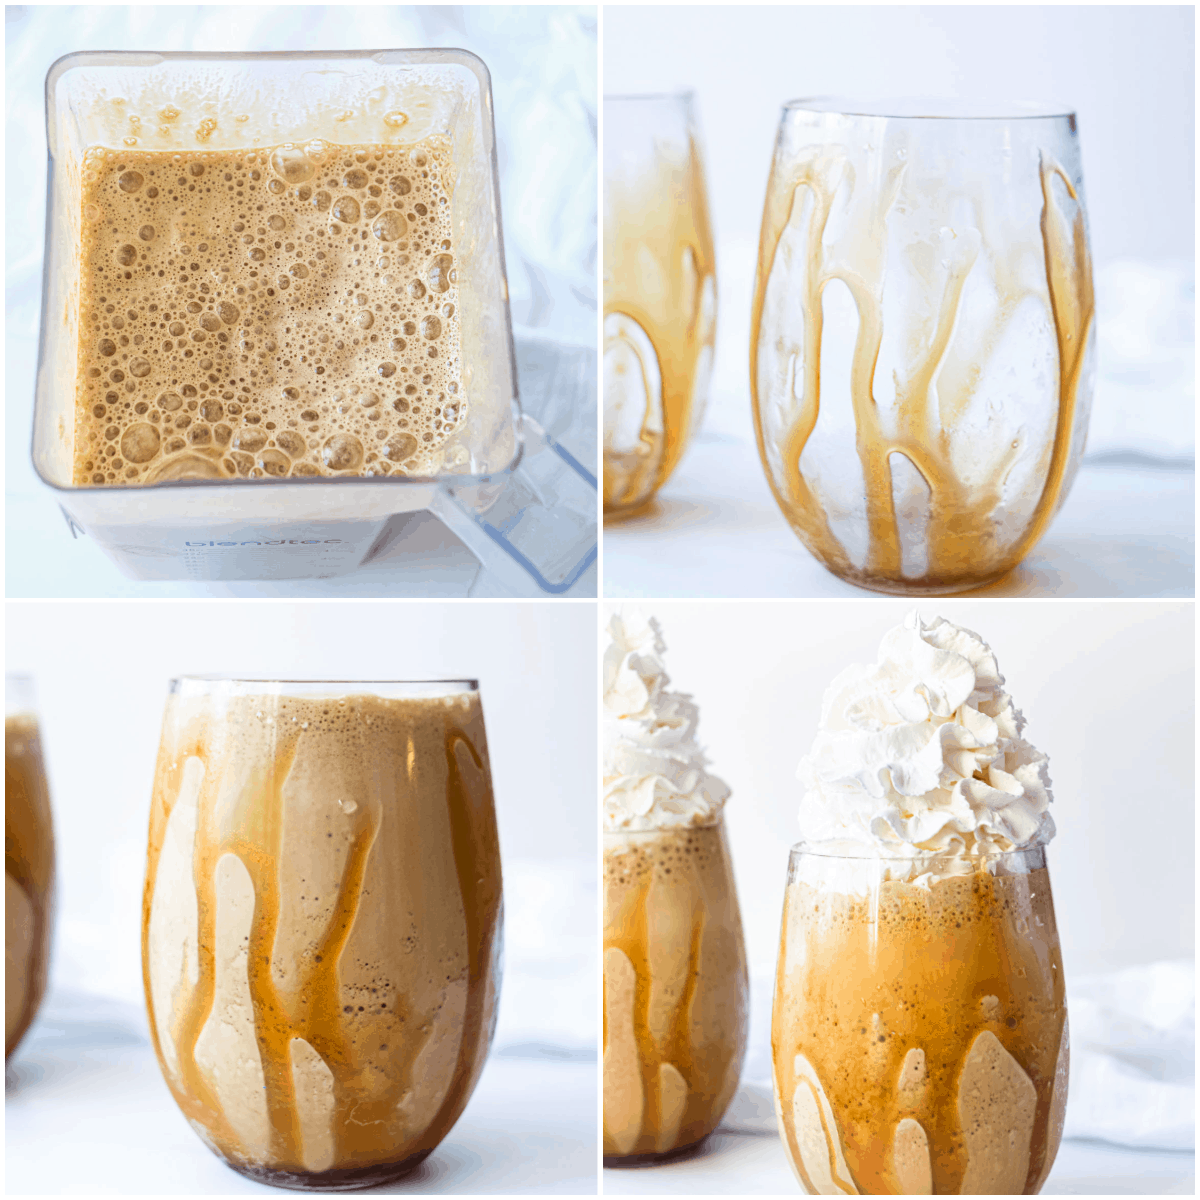 image collage showing the steps for making caramel frappe